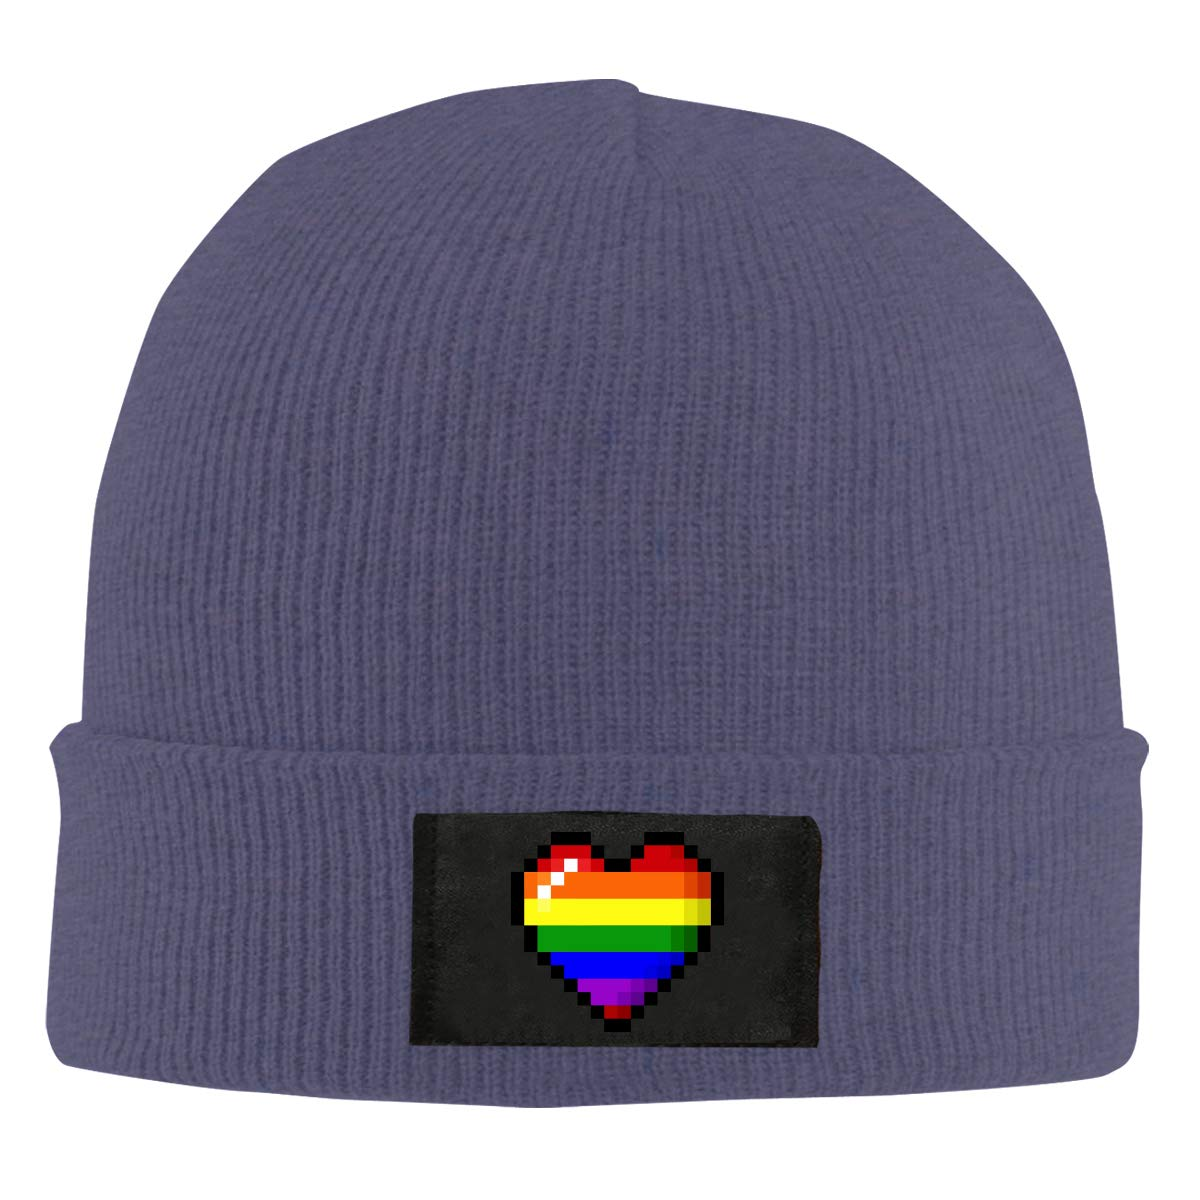 100/% Acrylic Thick Skull Cap Unisex Rainbow Gay Pride Heart Knitted Cap